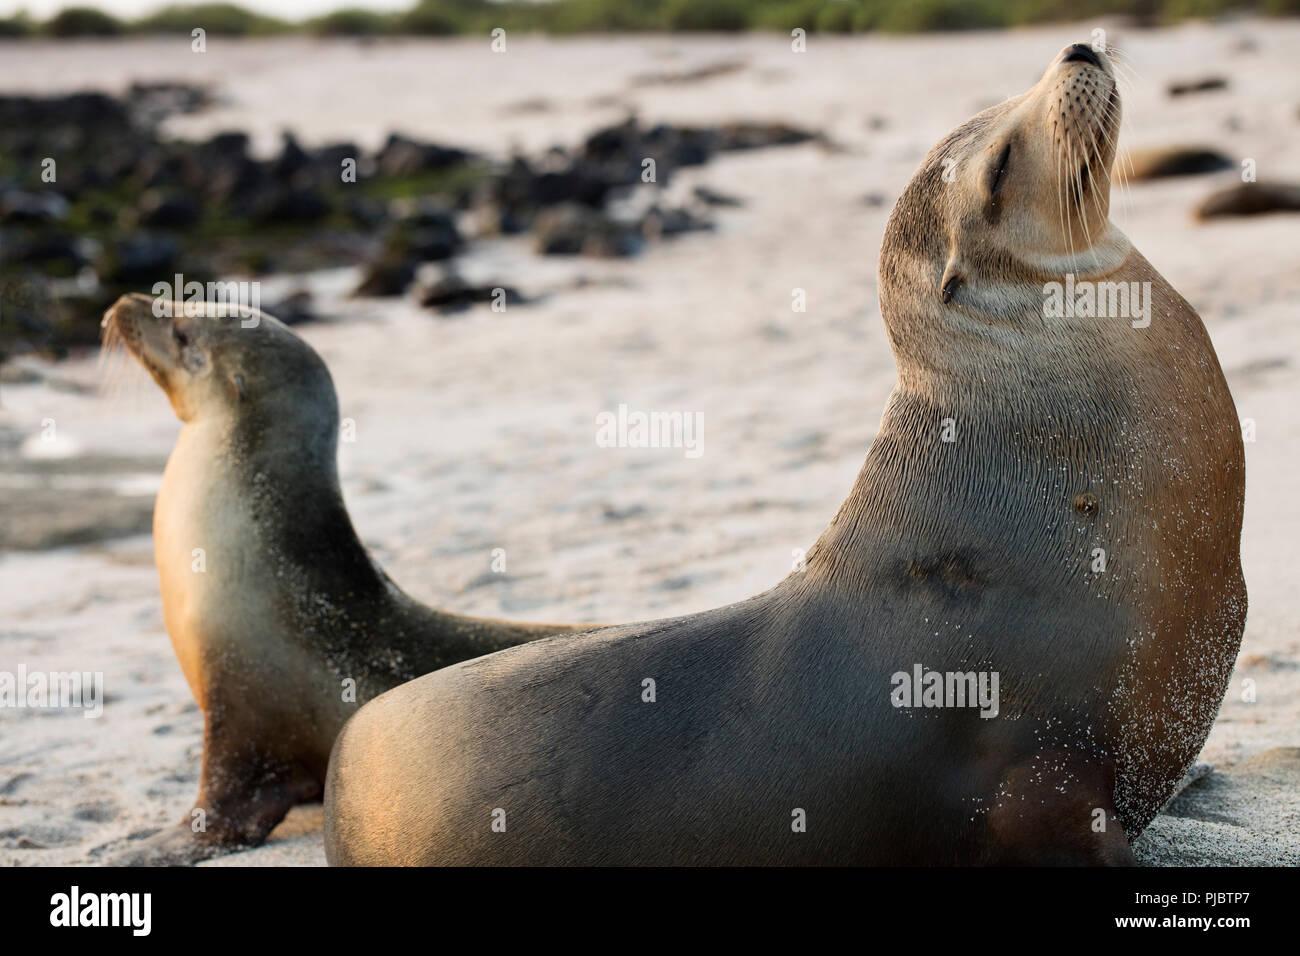 Facing opposite sides. A pair of Galapagos Sea Lions at the Beach in San Cristobal, Galapagos, Ecuador - Stock Image